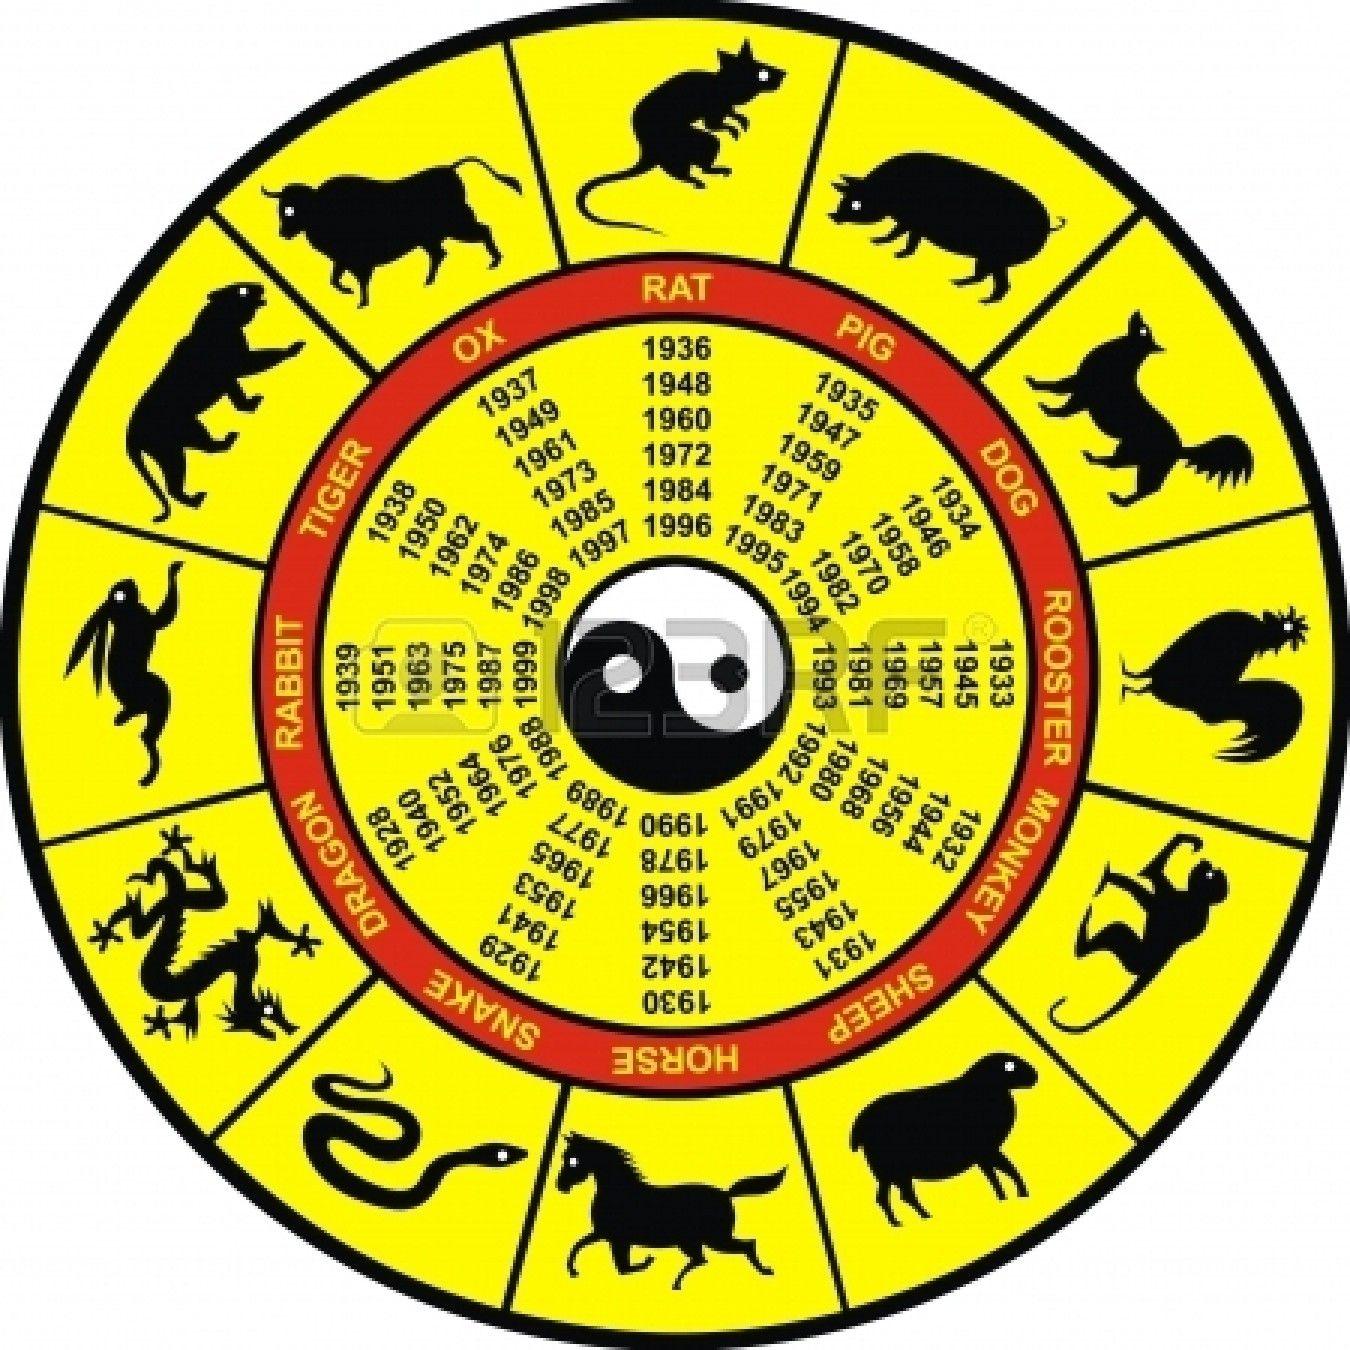 Chinese-Astrology-Chinese-Zodiac-Horoscope-Wheel-Chart (1350